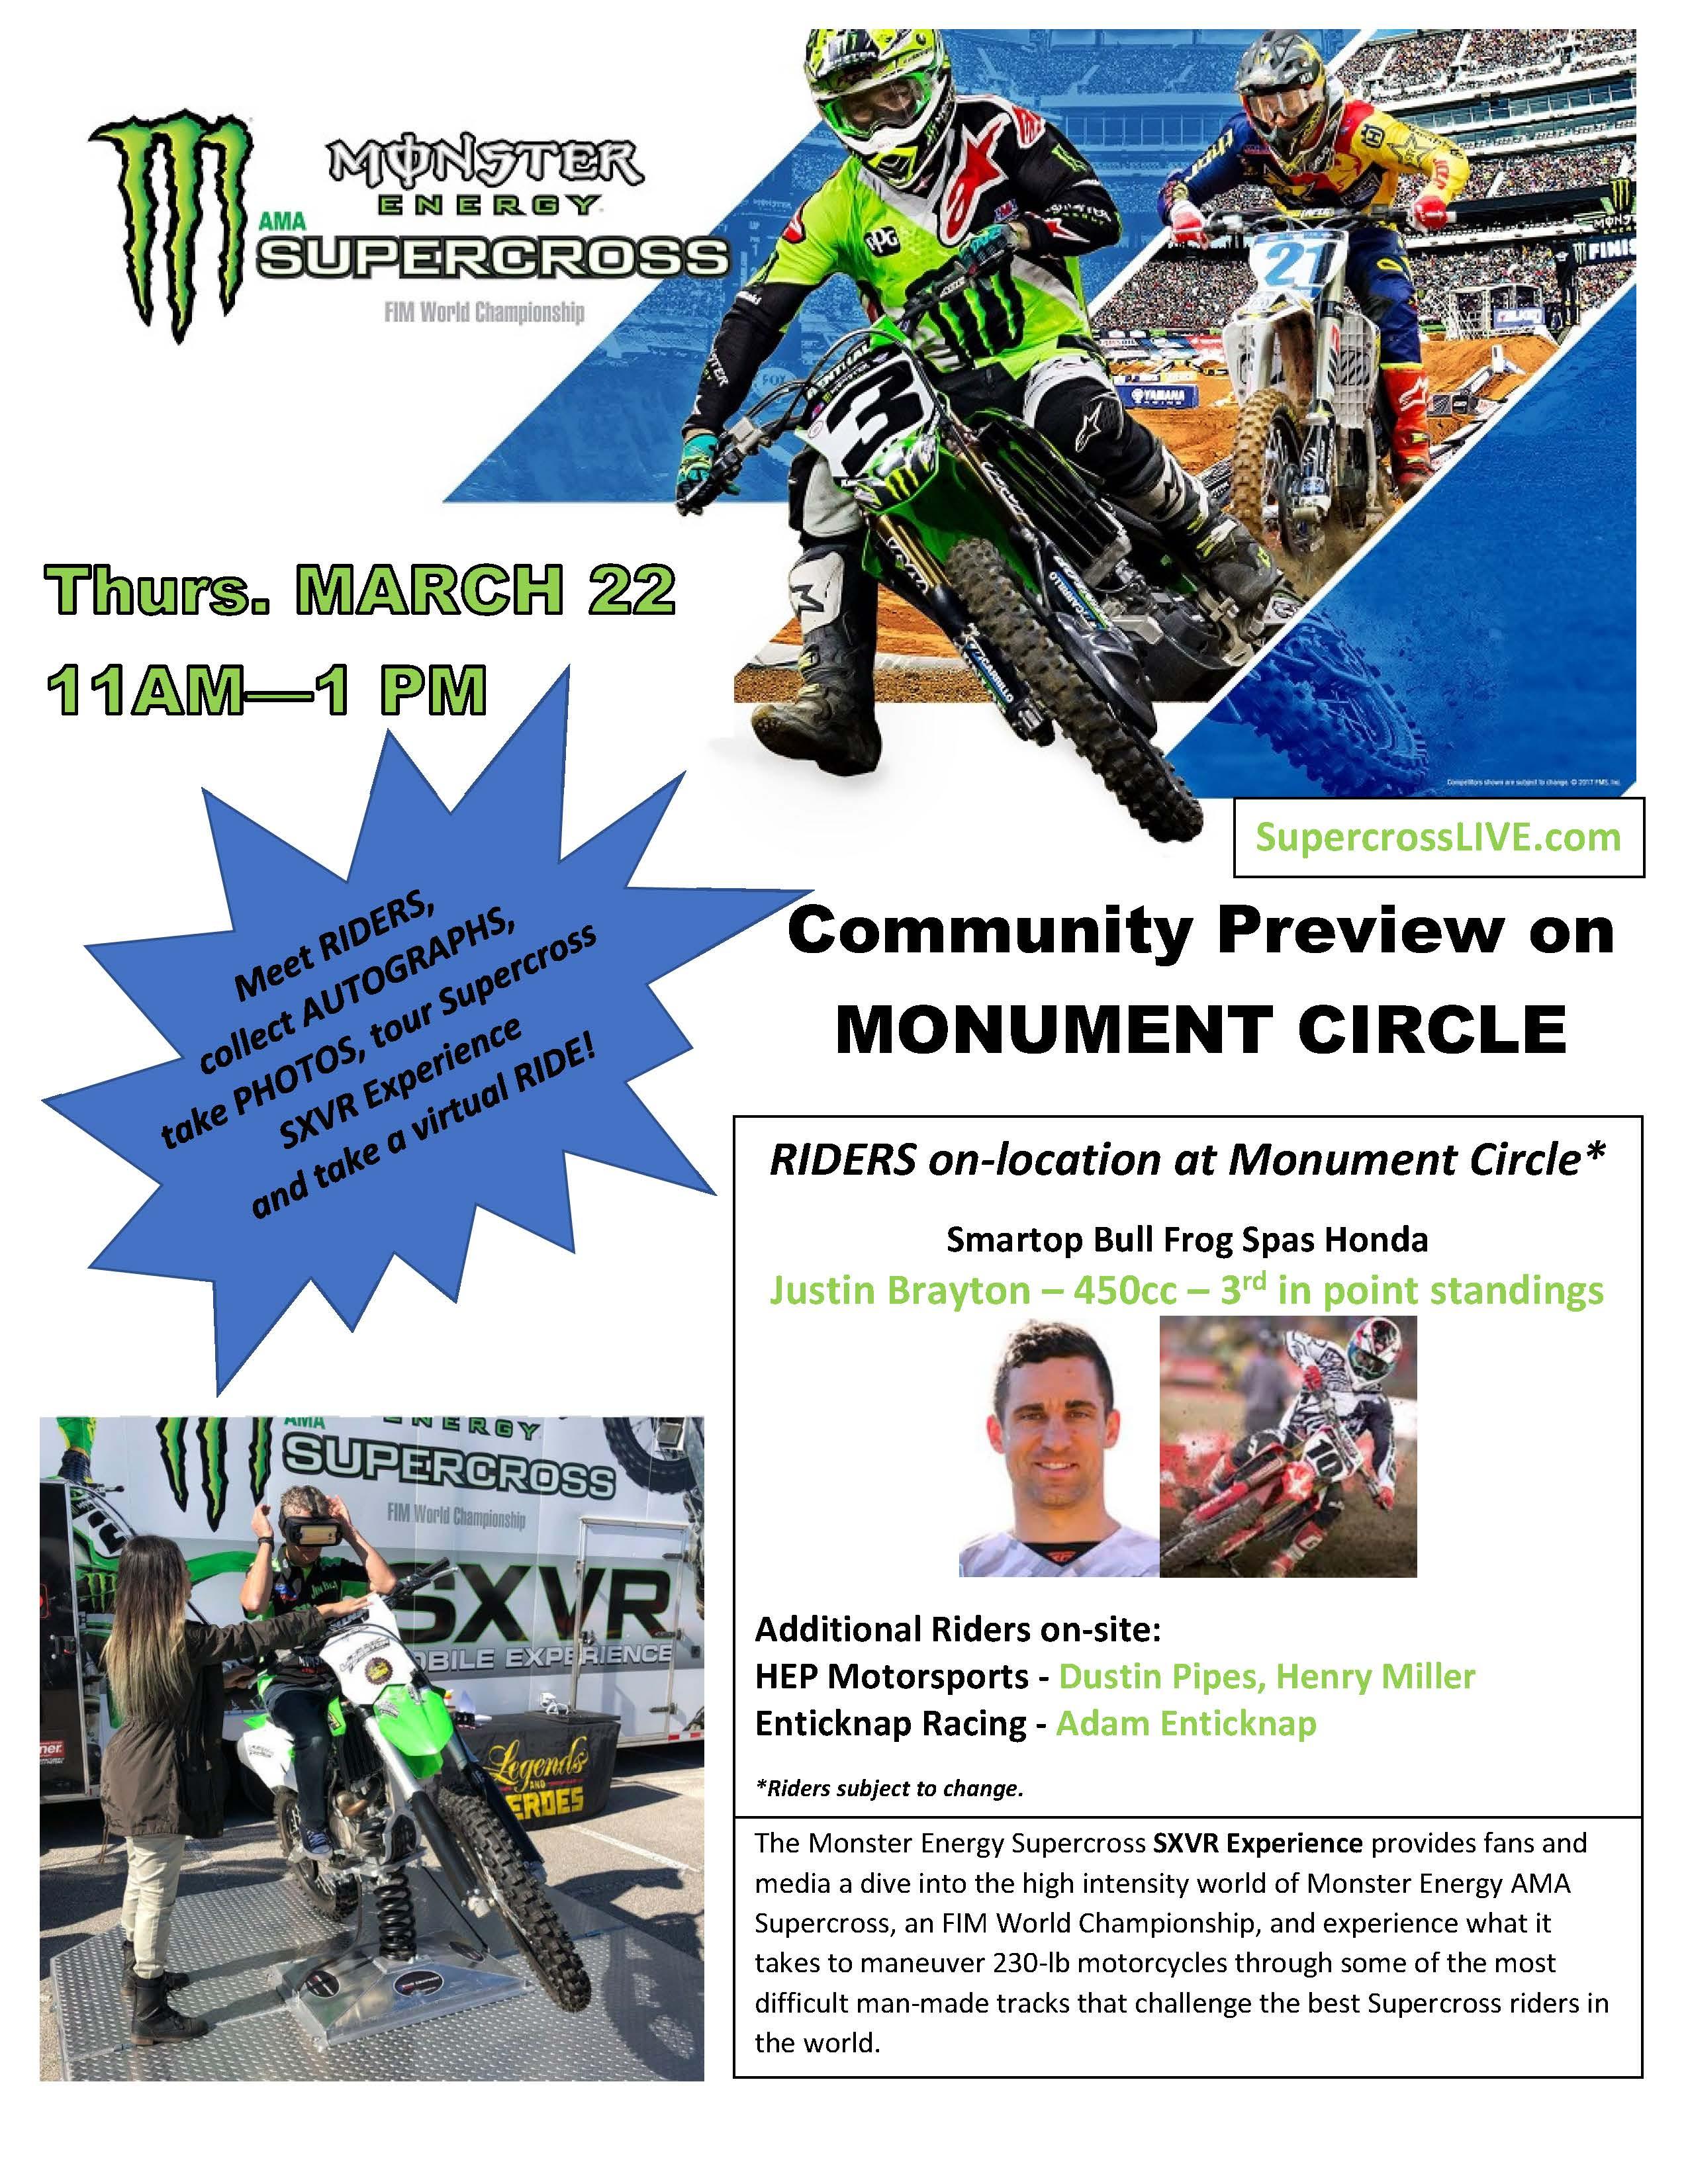 Indianapolis Preshow Event